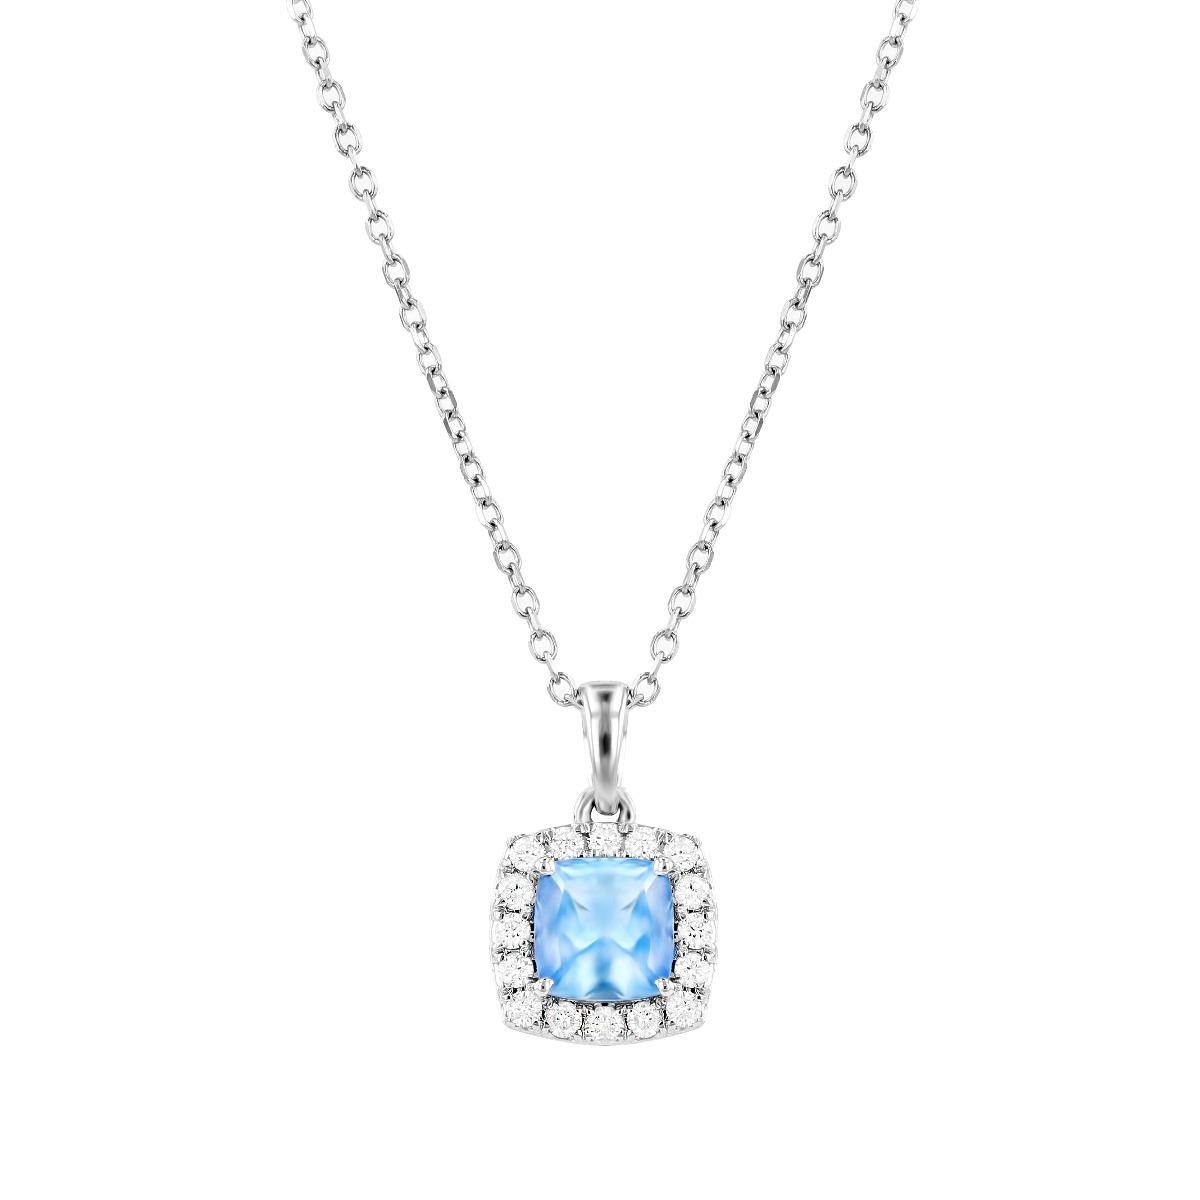 Rosa Mer Collection 0.45ct Cushion Aquamarine and Diamond Halo Necklace